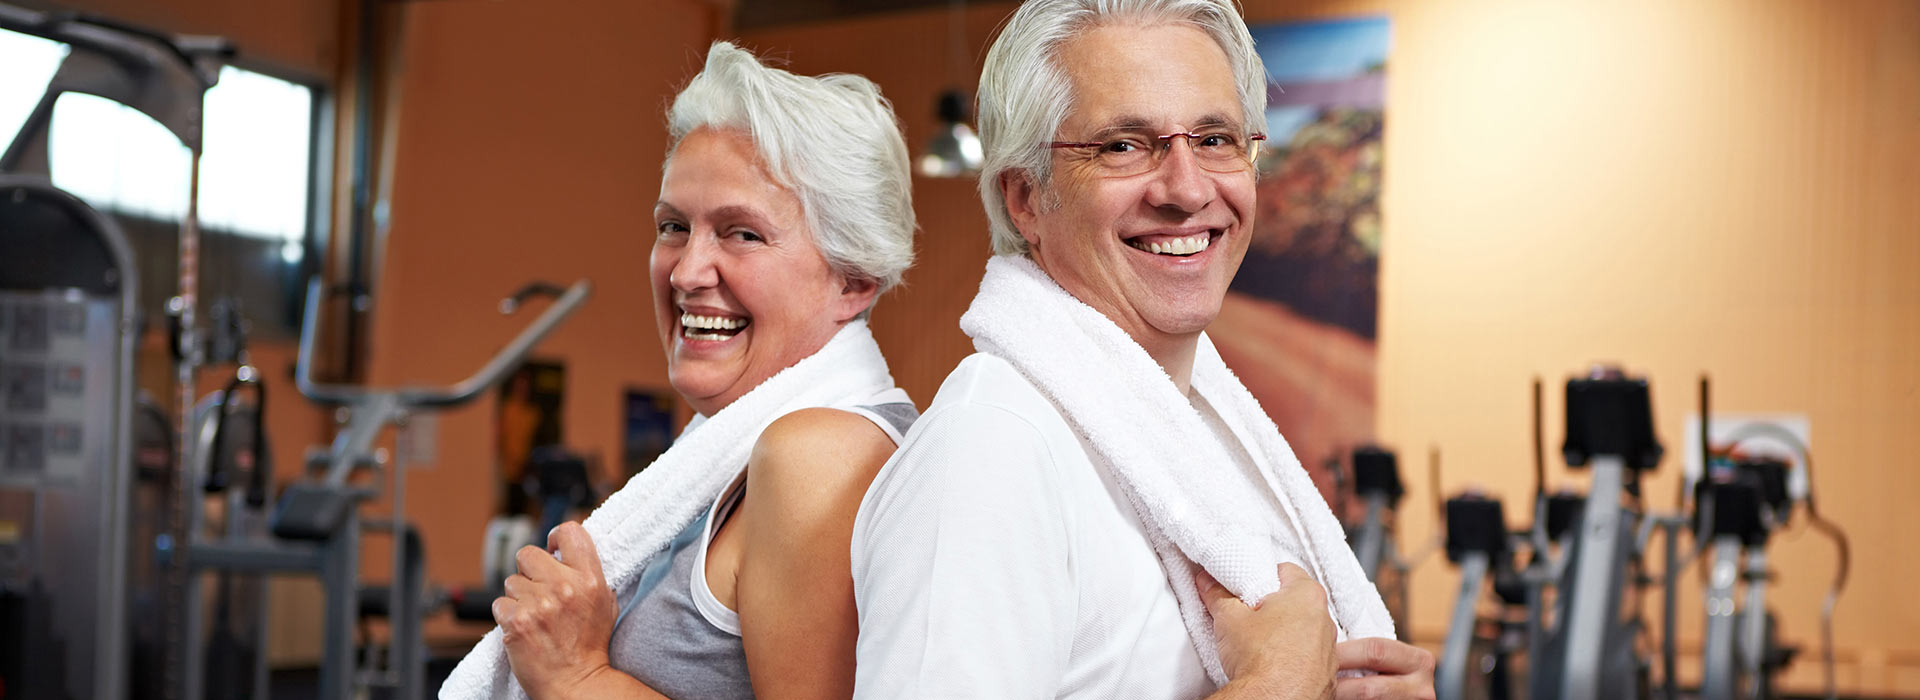 <small>Prävention - Rehabilitation - Fitness</small>VGS